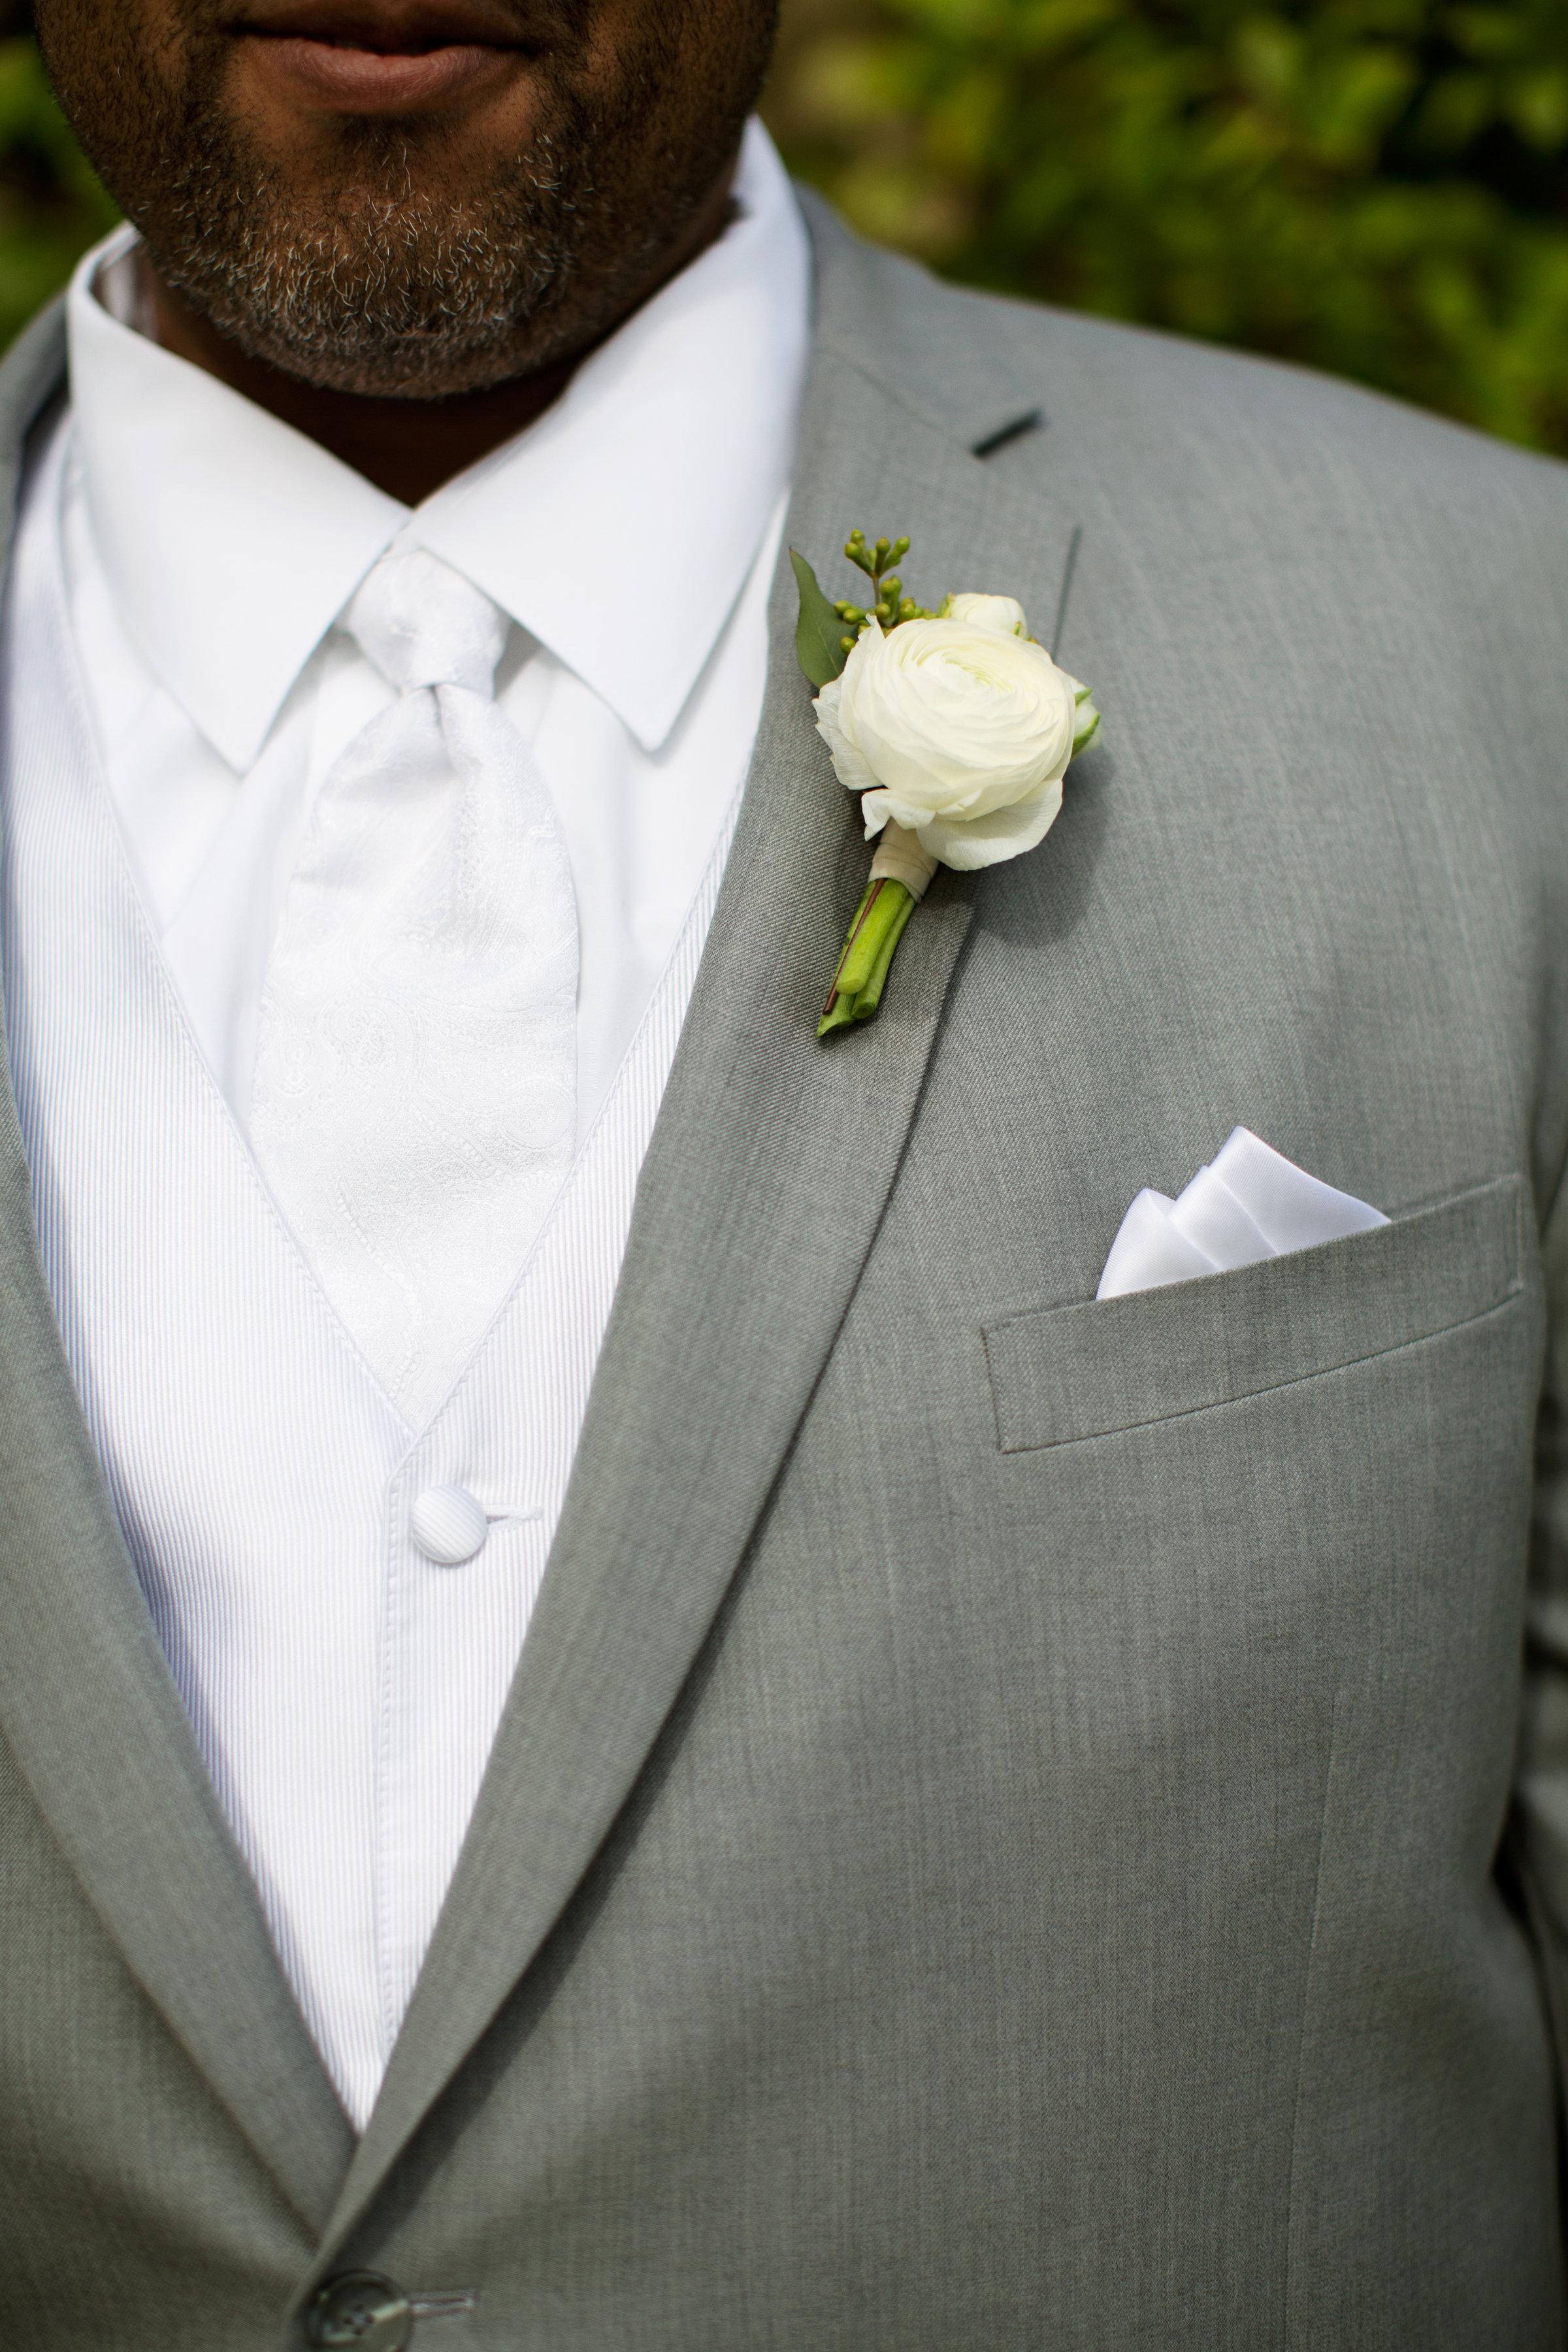 Ma Maison Austin Wedding Venue_ Austin Wedding Planner Heavenly Day Events _ Kristi Wright Austin Wedding Photographer20160306_0134.JPG